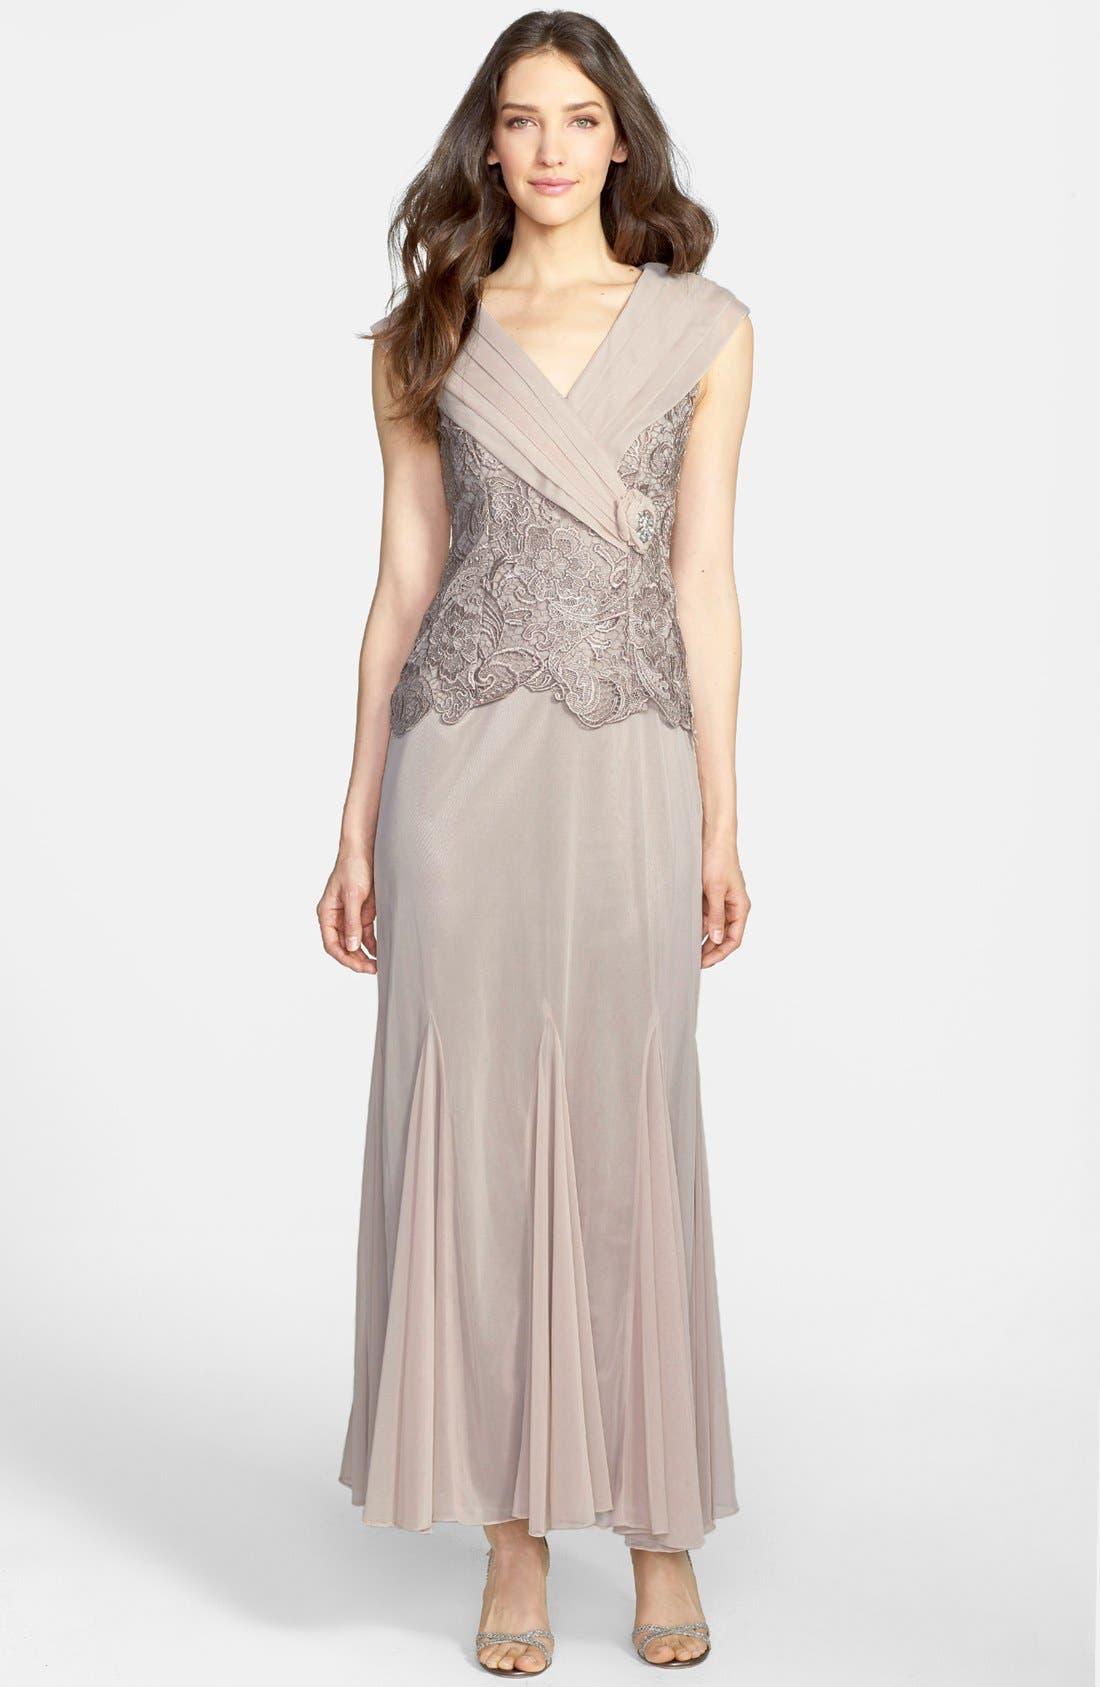 Alternate Image 1 Selected - Patra Venice Lace & Chiffon Dress